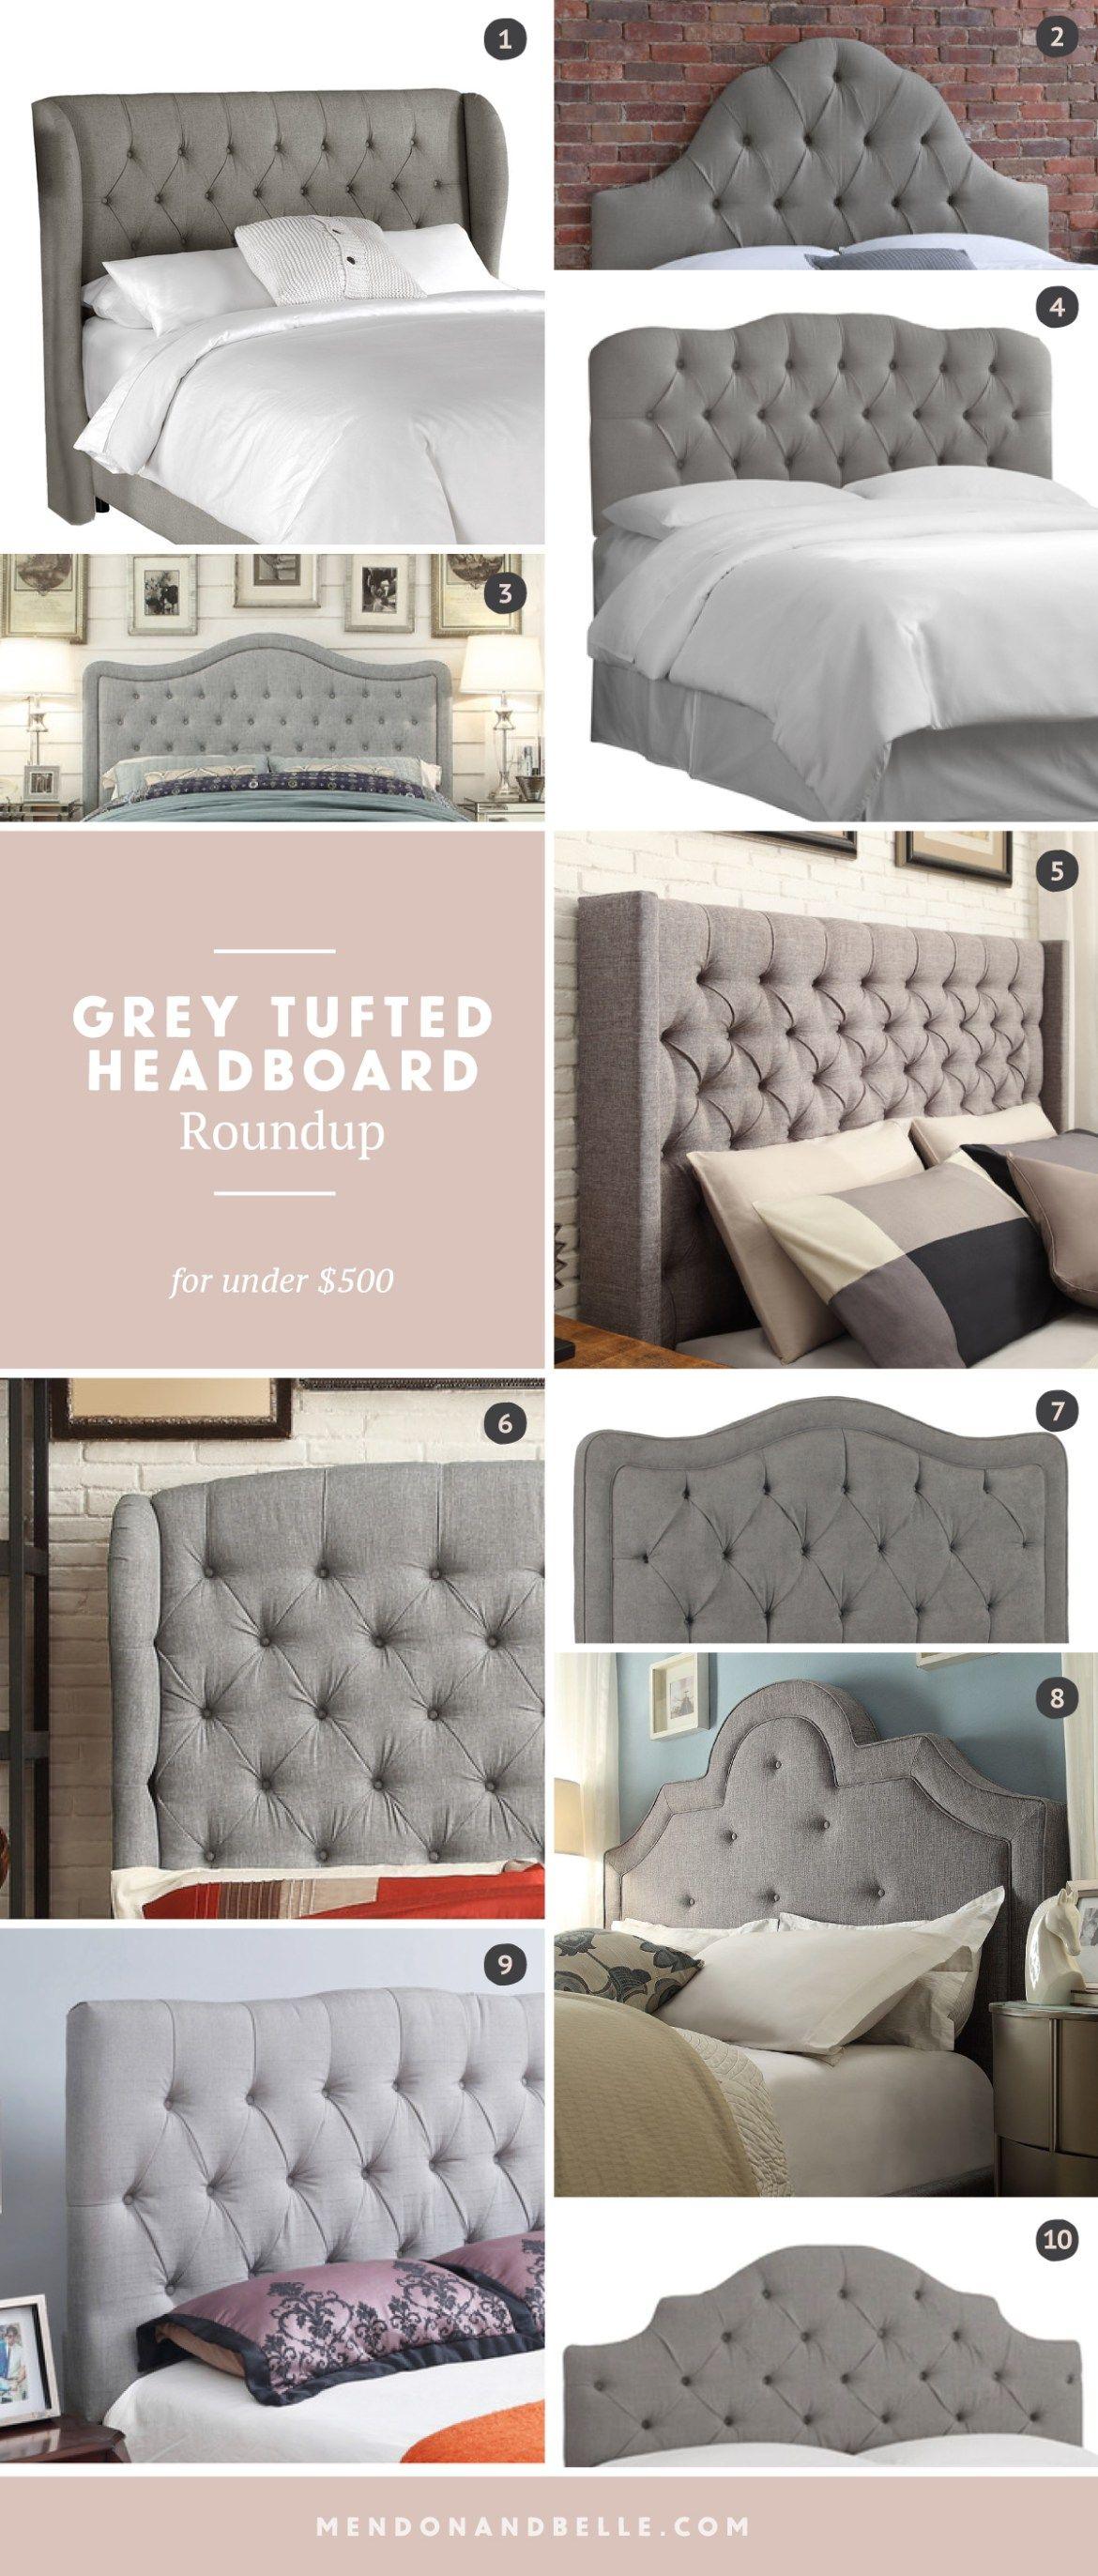 tufted w shop trim upholstered nailhead grey charcoal headboard